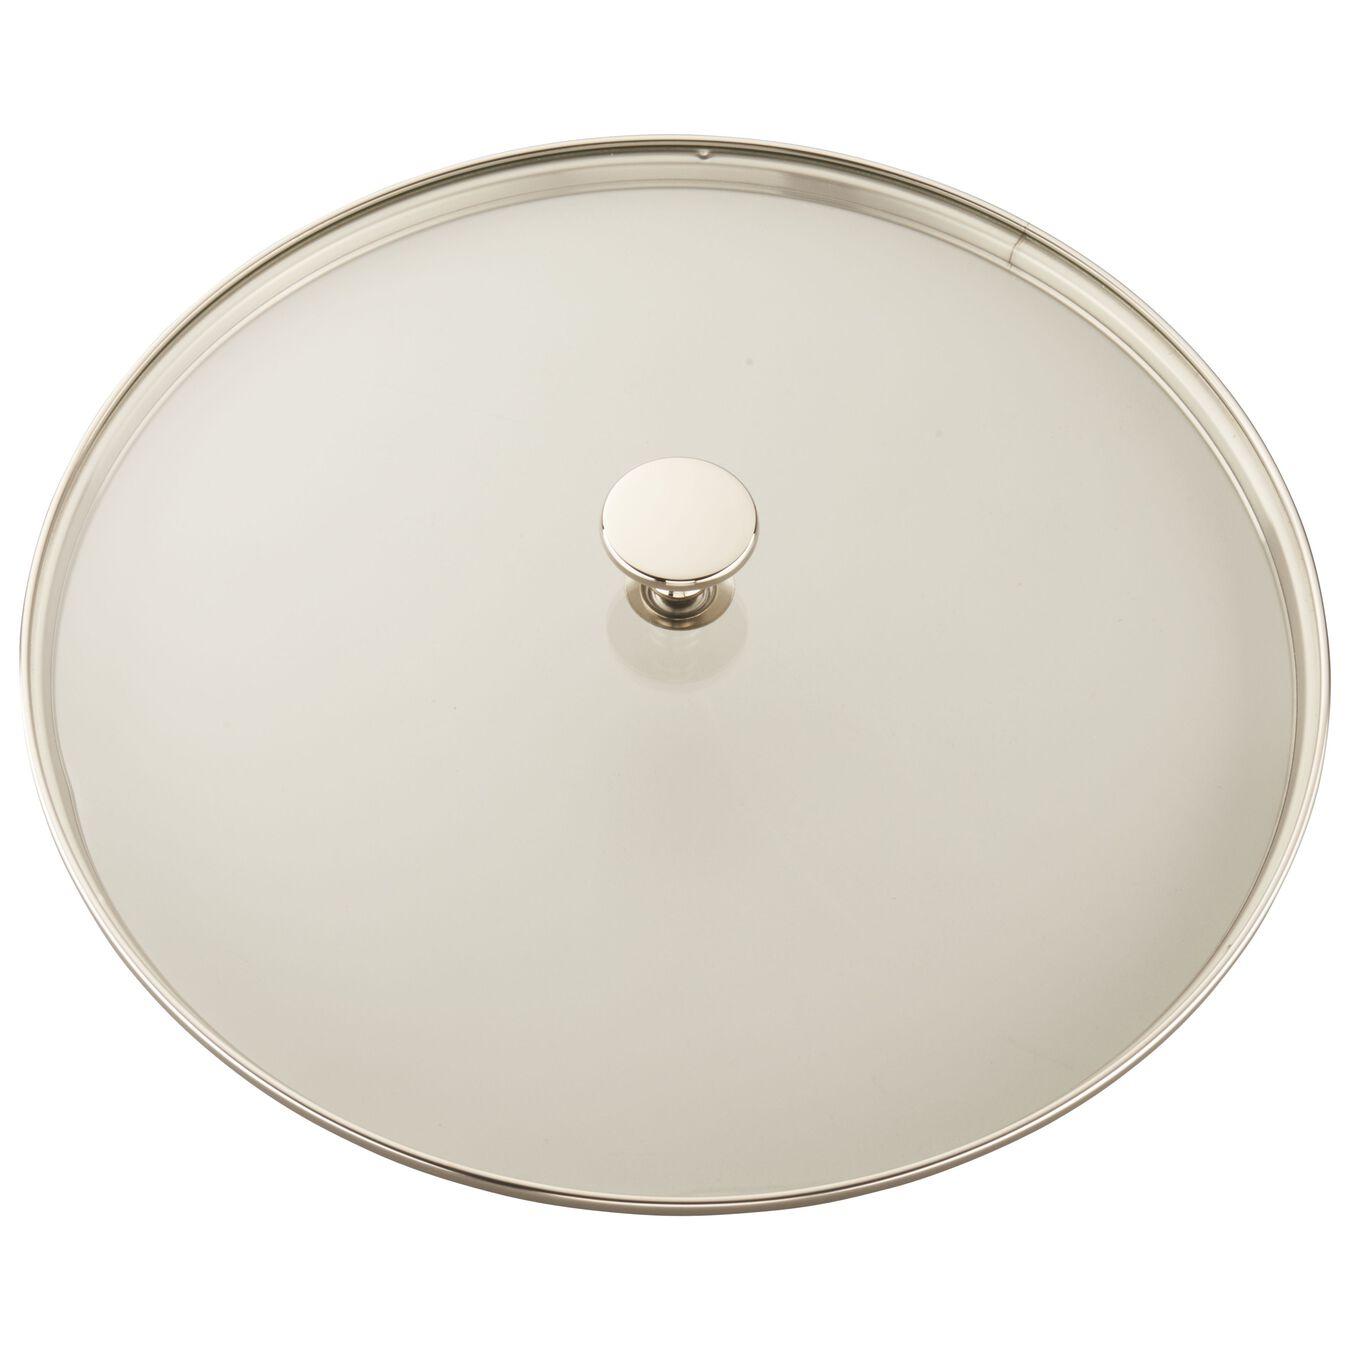 12-inch Round Steam Grill - White,,large 4